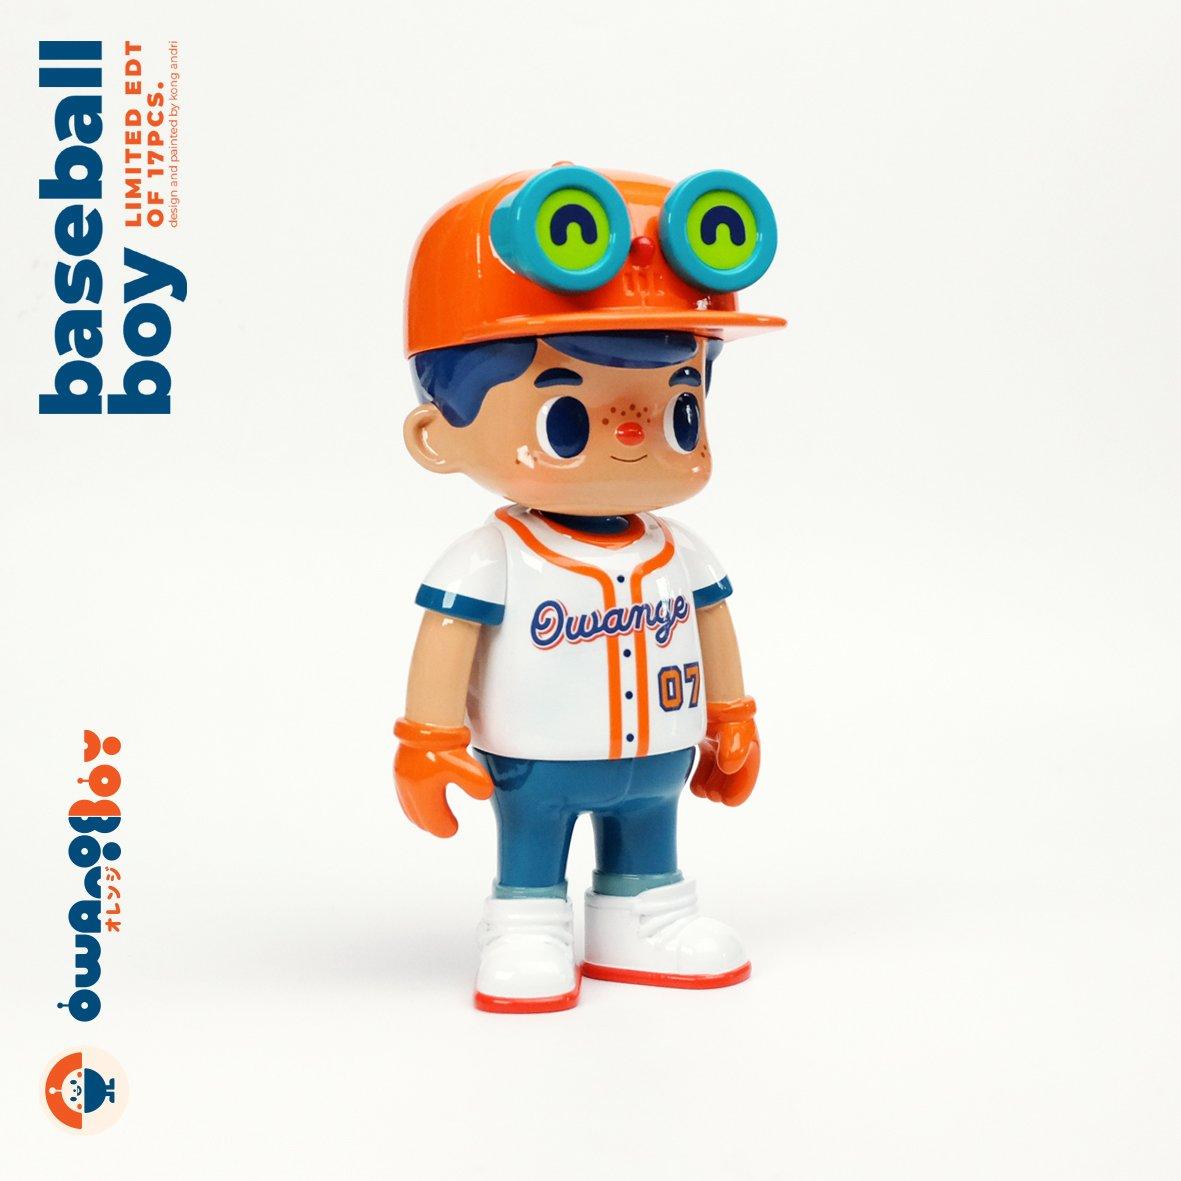 Image of owangeboy statue - baseball boy